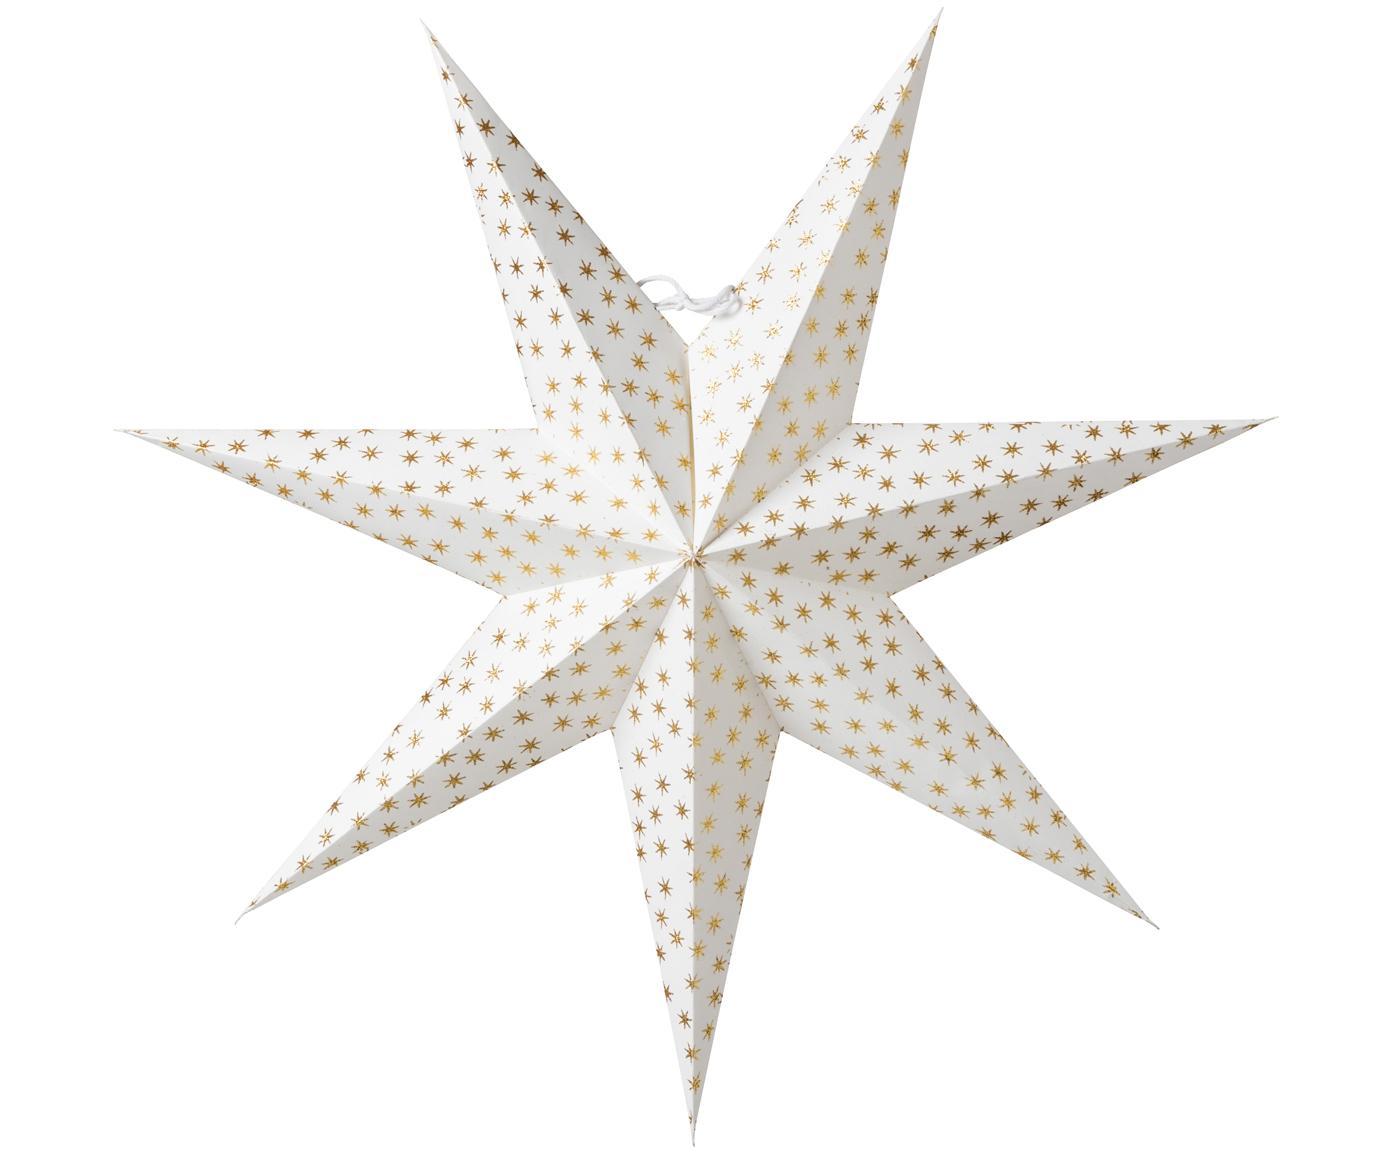 Estrella artesanal Asta, Papel, Blanco, dorado, Ø 60 cm